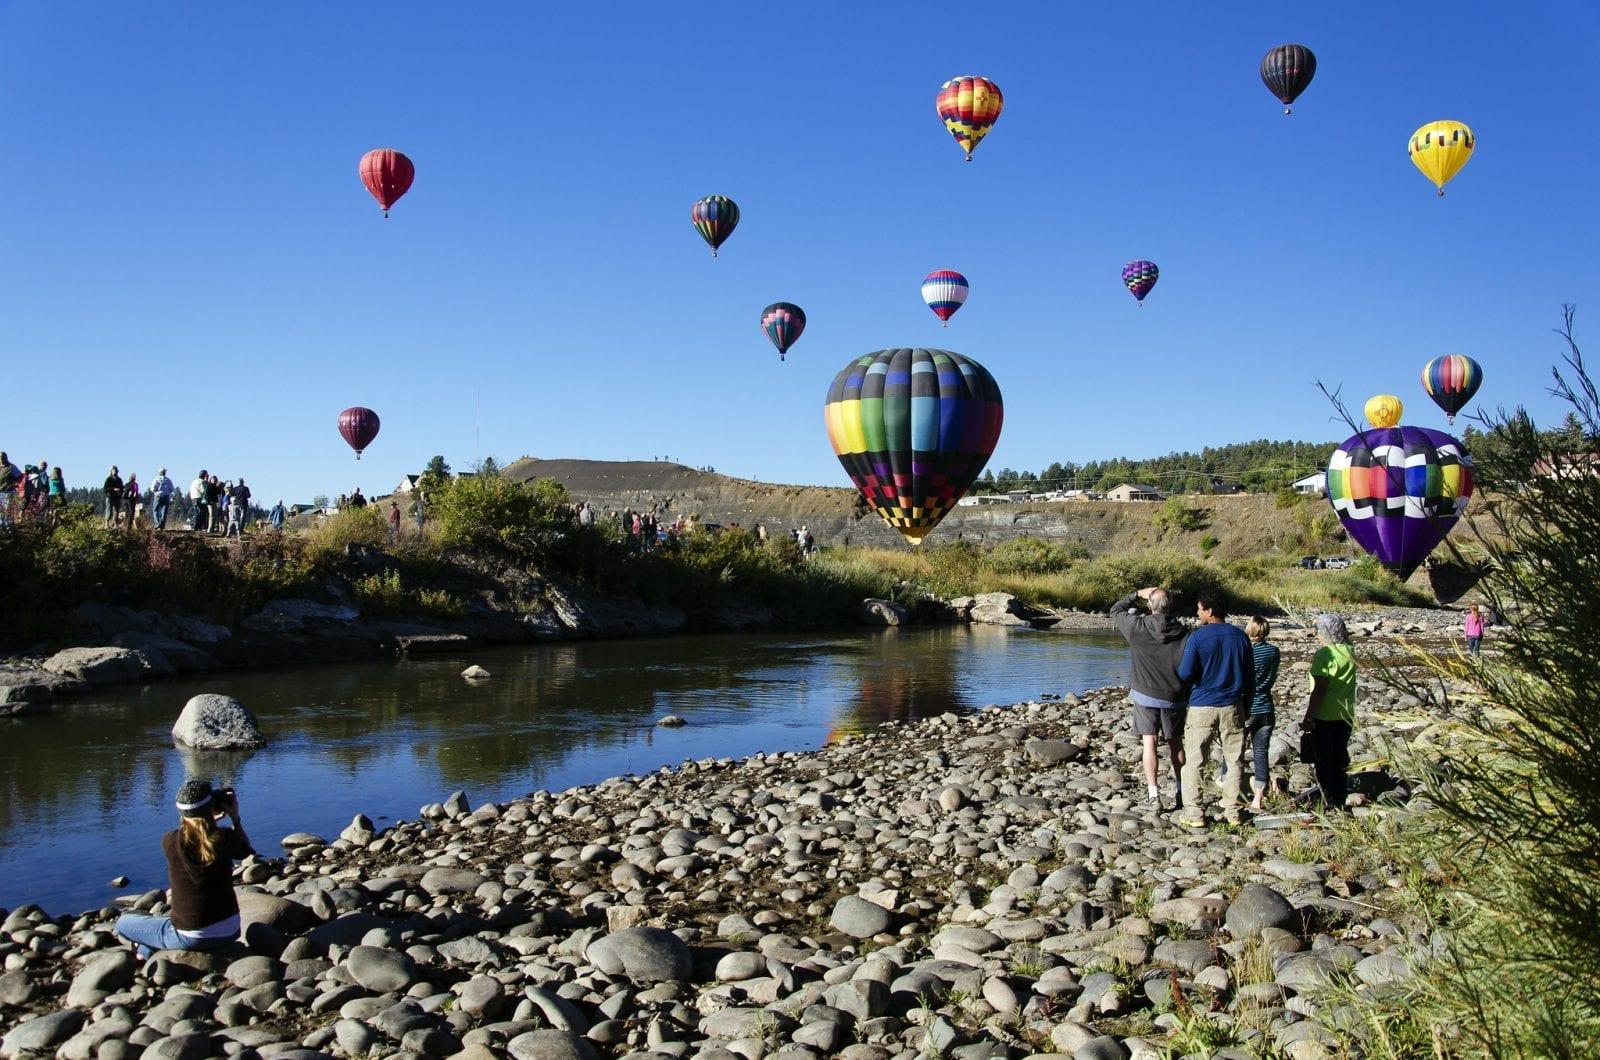 Image of a hot balloon festival at the San Juan River